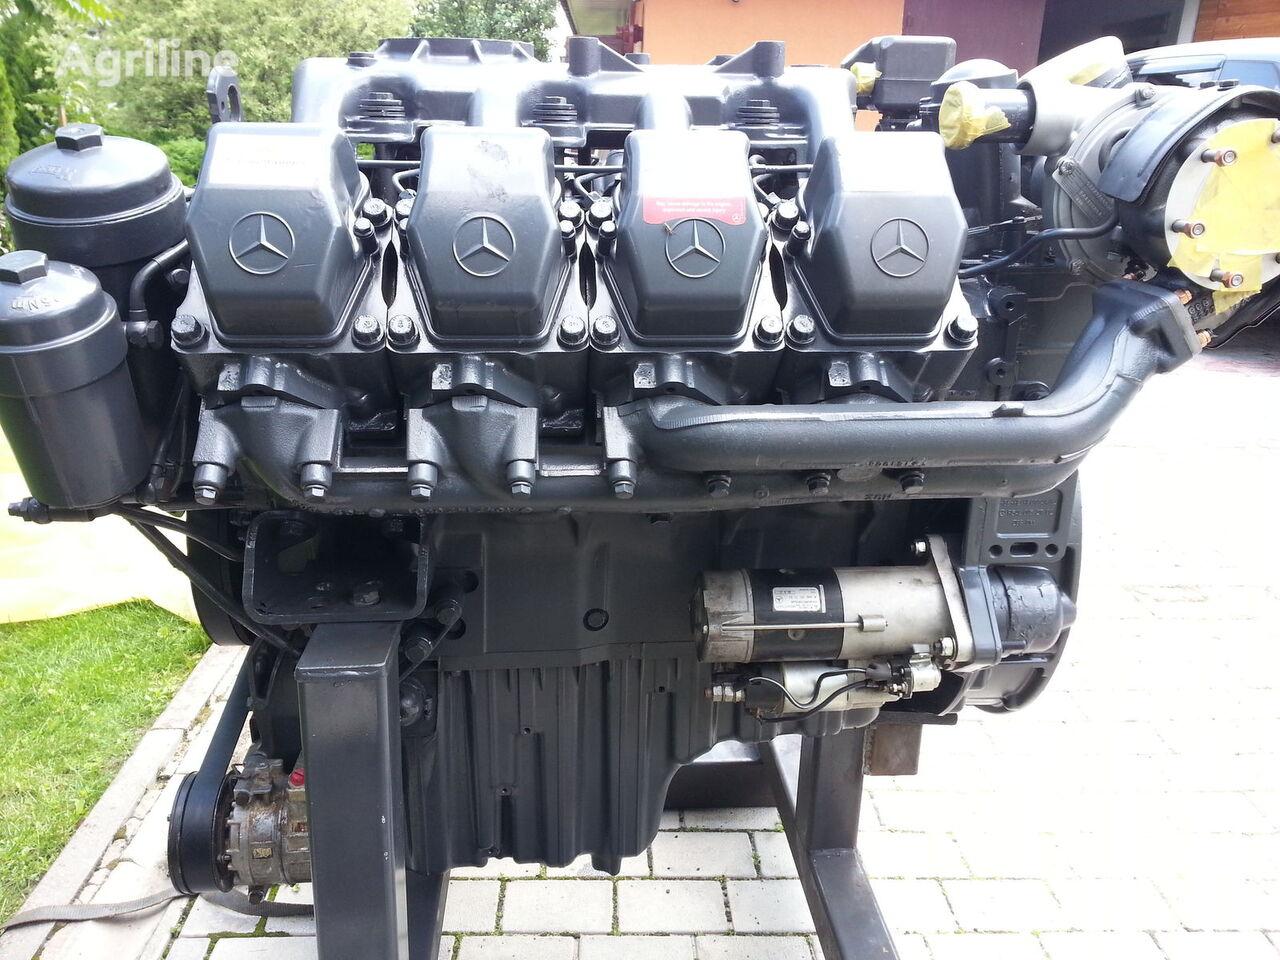 new MERCEDES-BENZ OM 502 LA (942.992) engine for CLAAS grain harvester